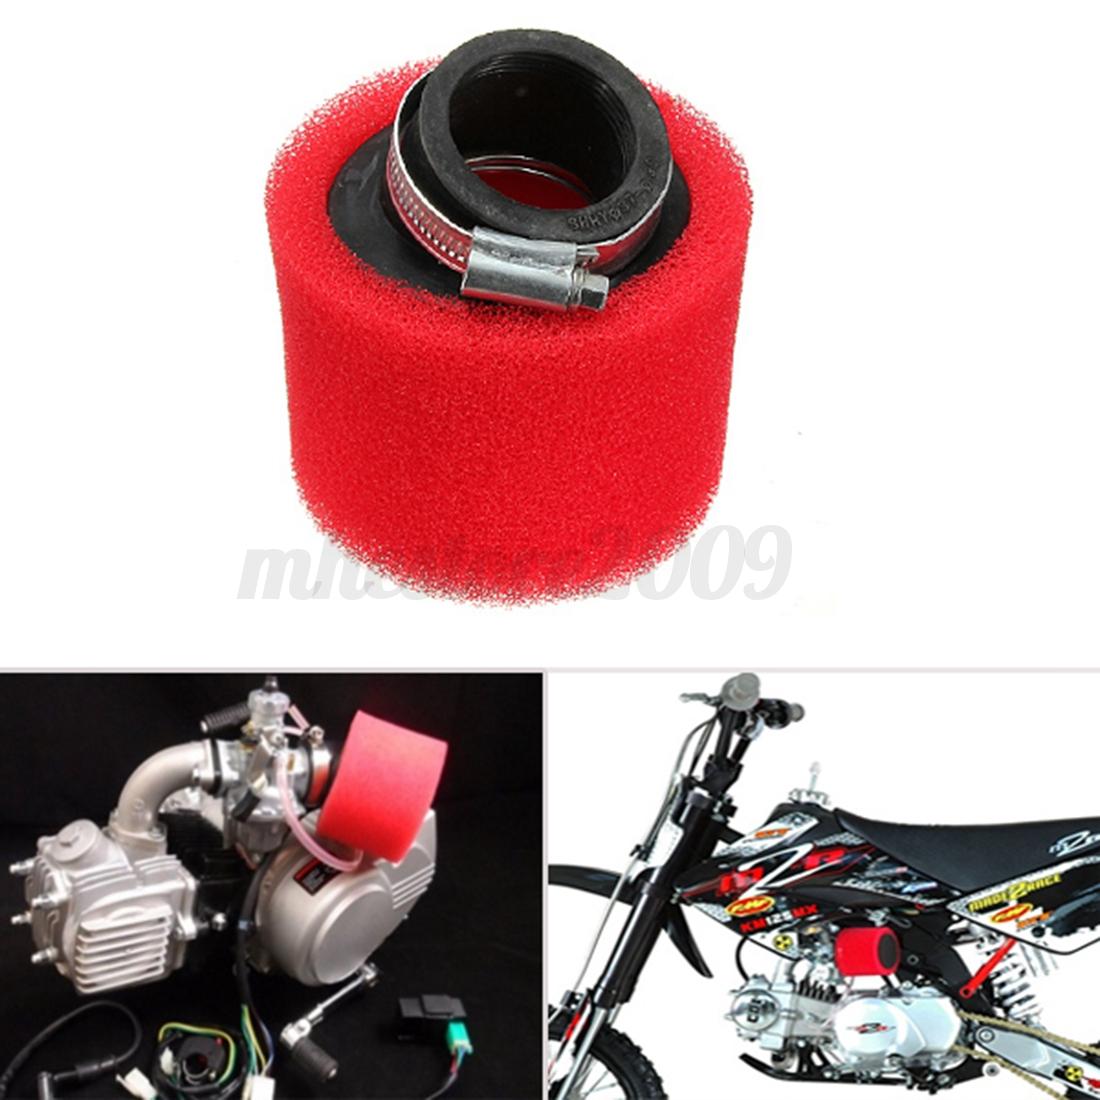 38mm  Air Filter for 90cc-125cc QUAD Go Kart Dirt bike  Pit Bike Motorcycle  ea